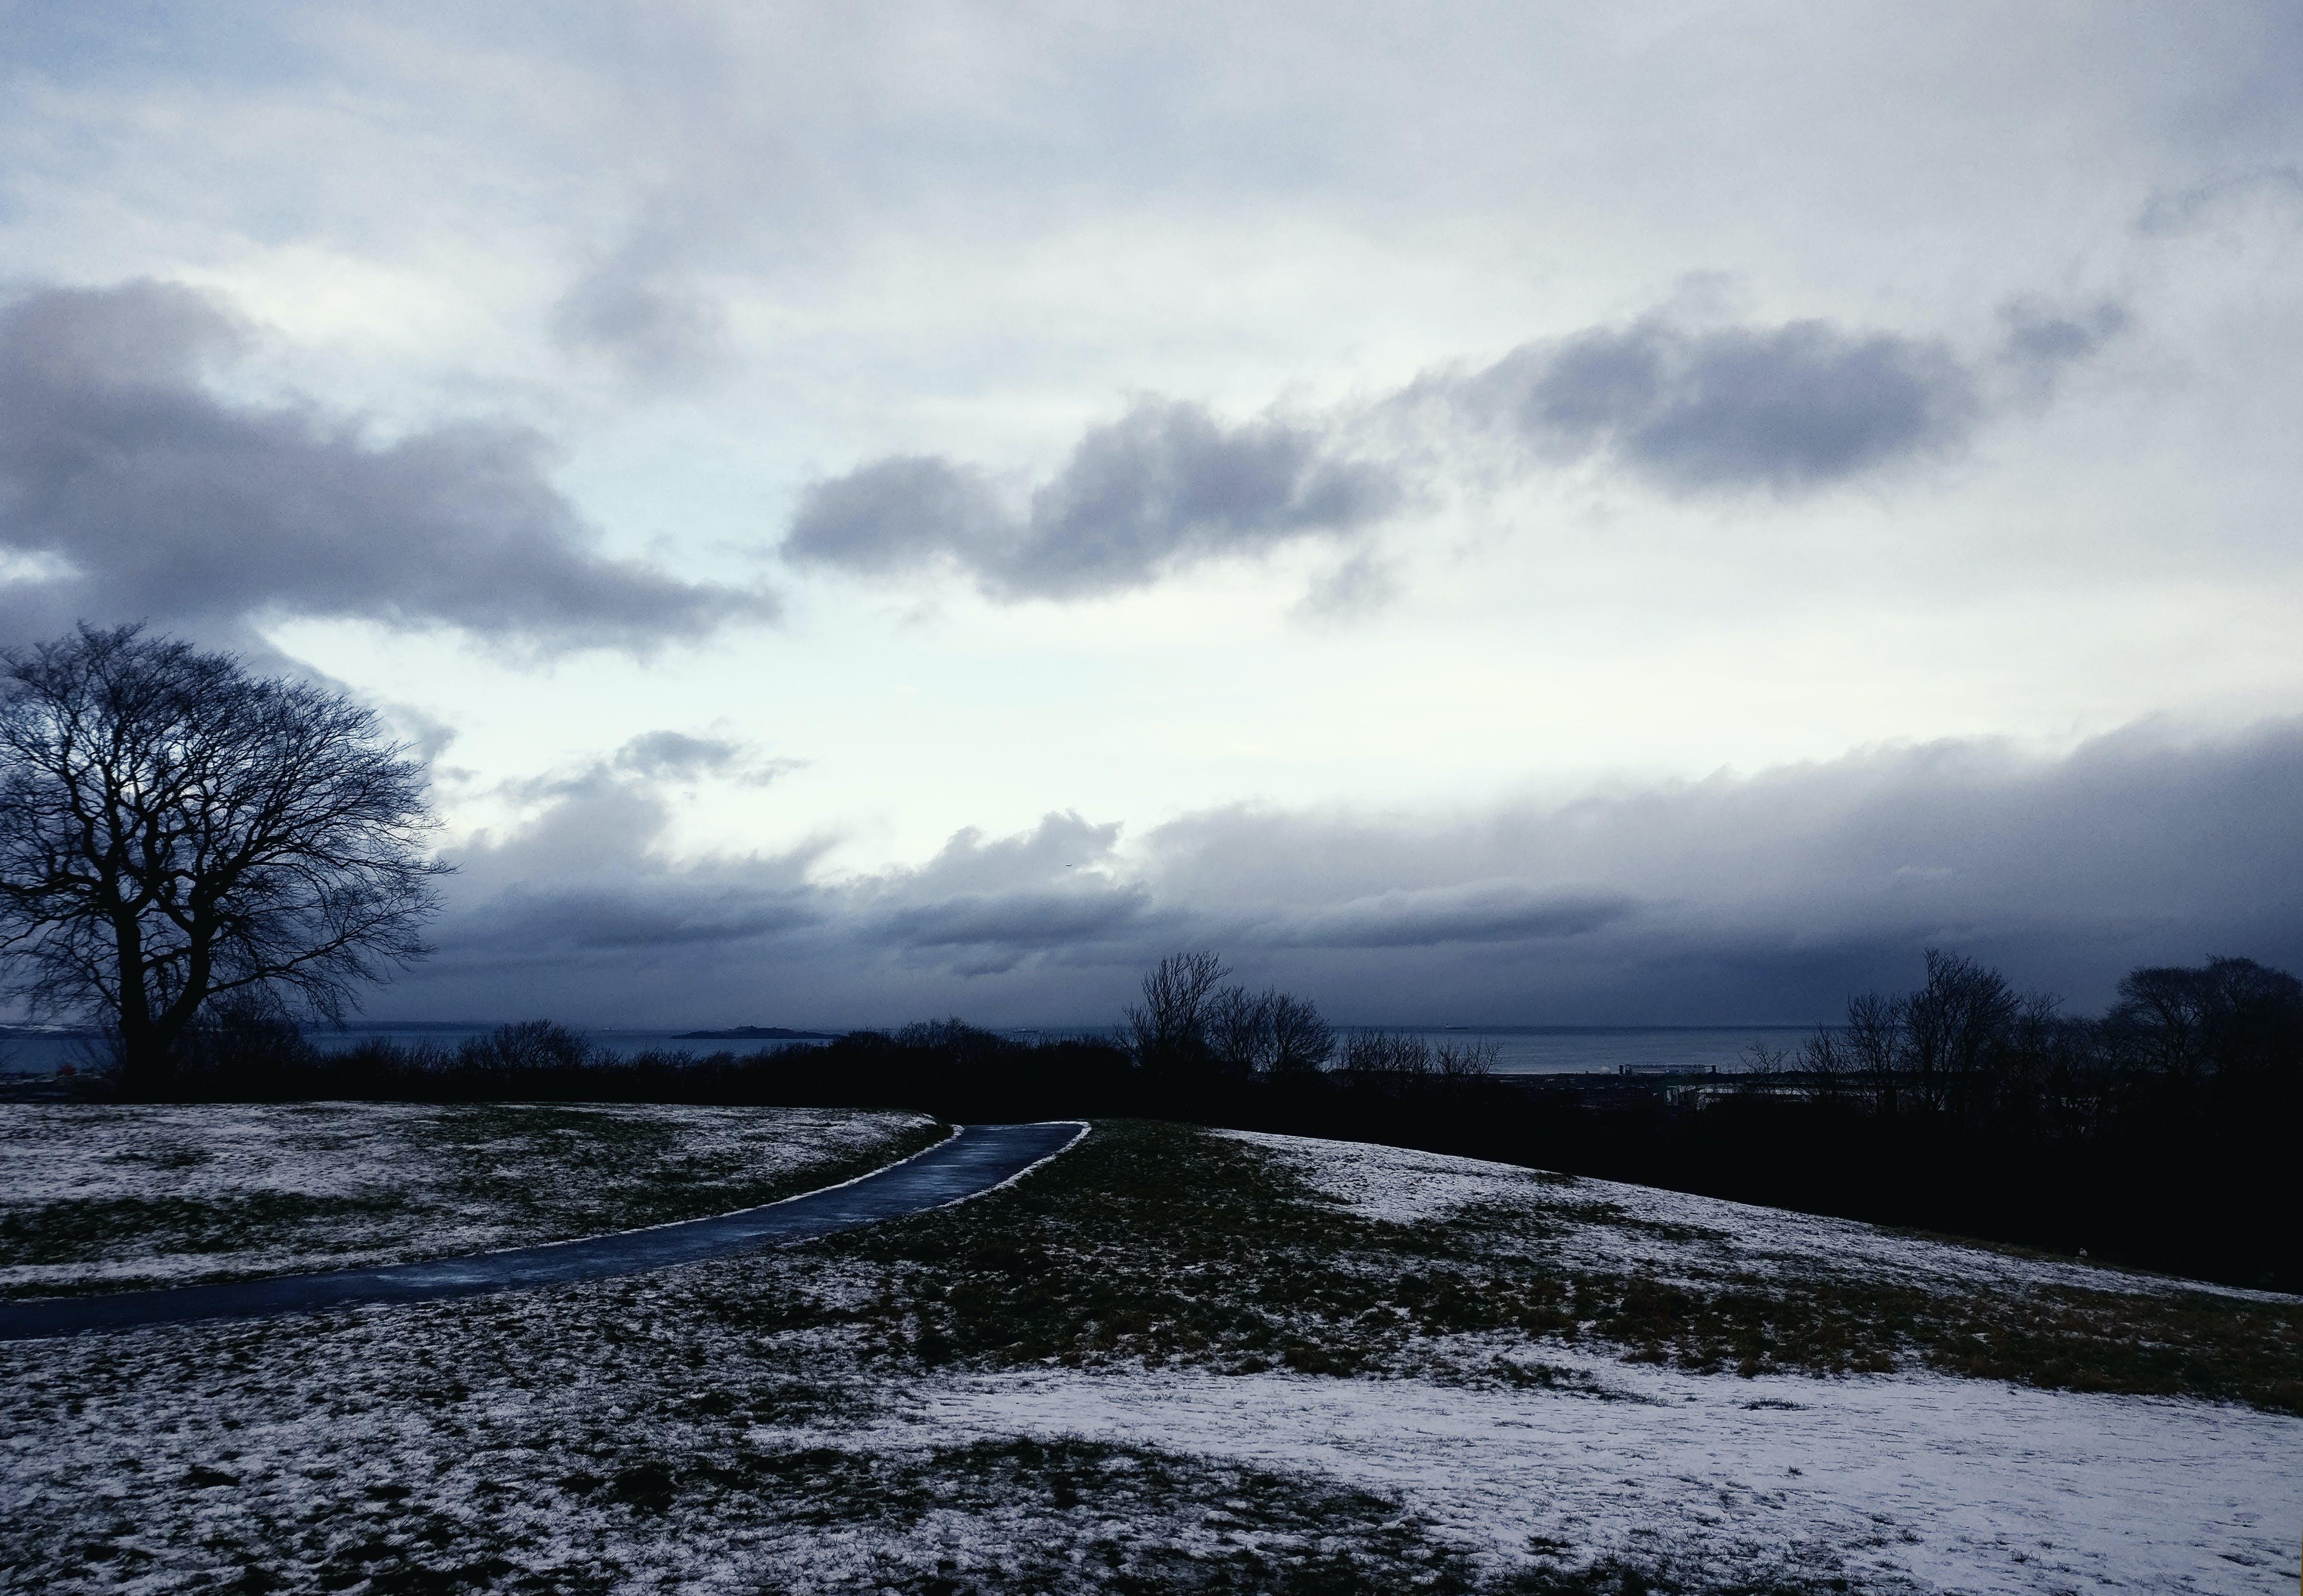 Free stock photo of calton hill, dull evening, evening, gloomy